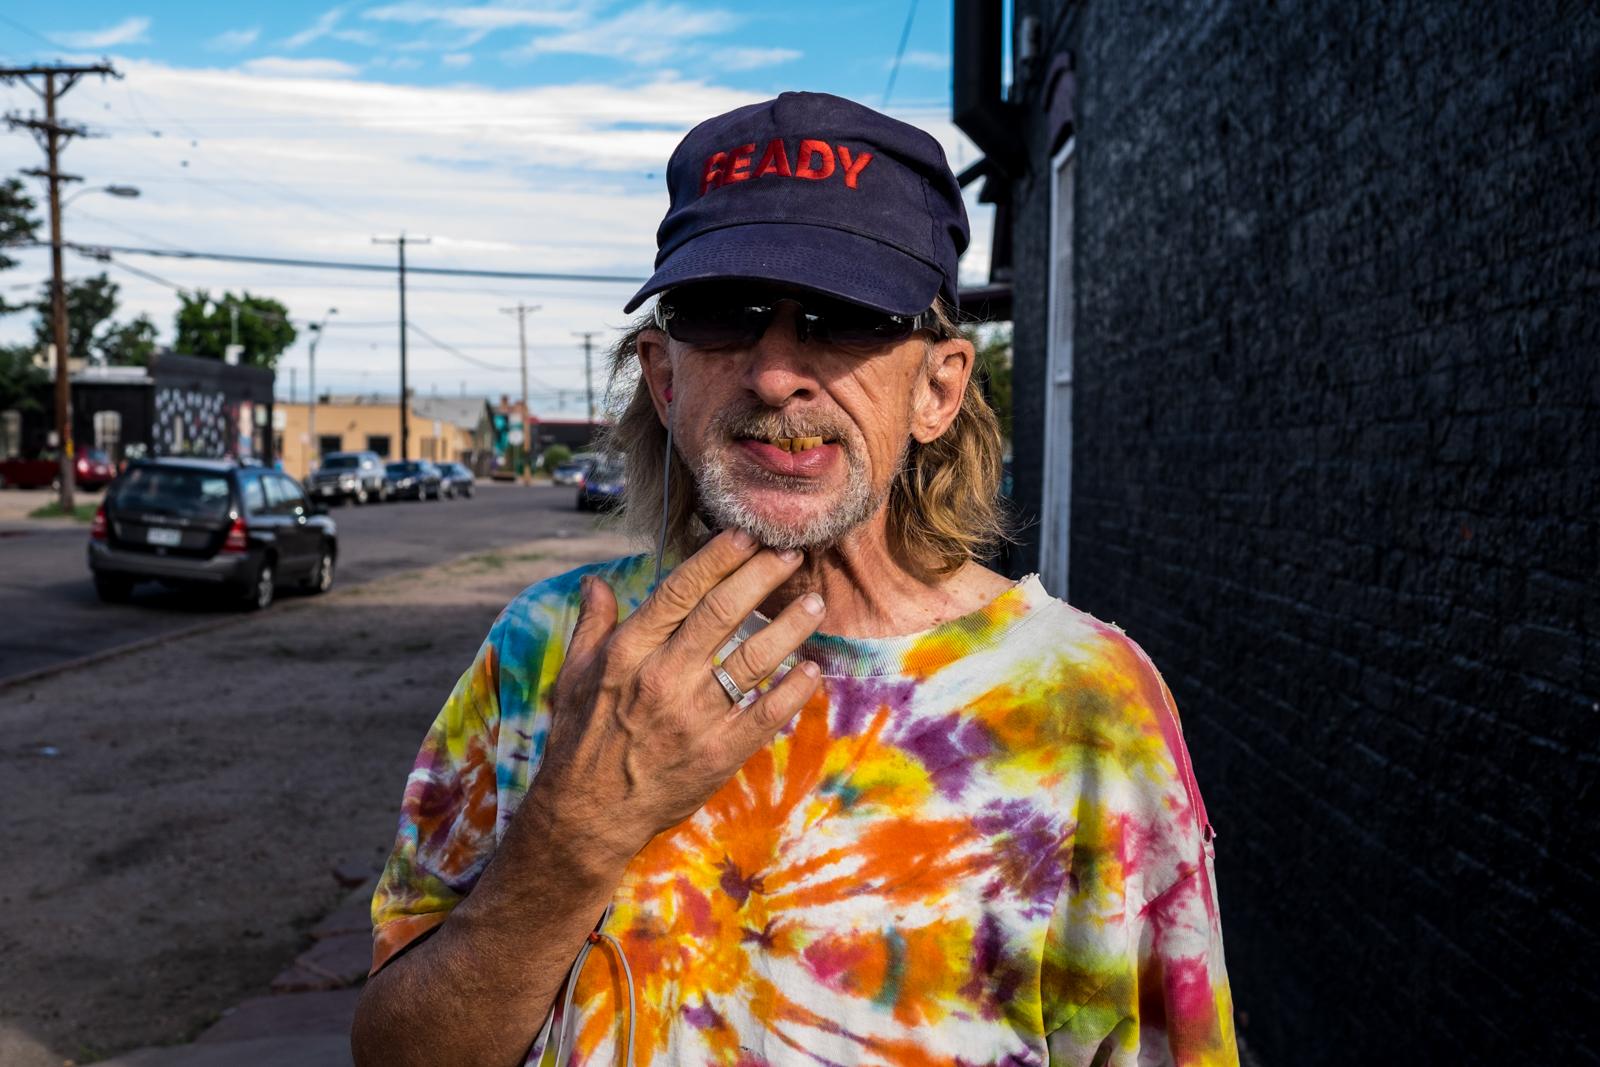 gregory bethmann_street photographer-47.jpg